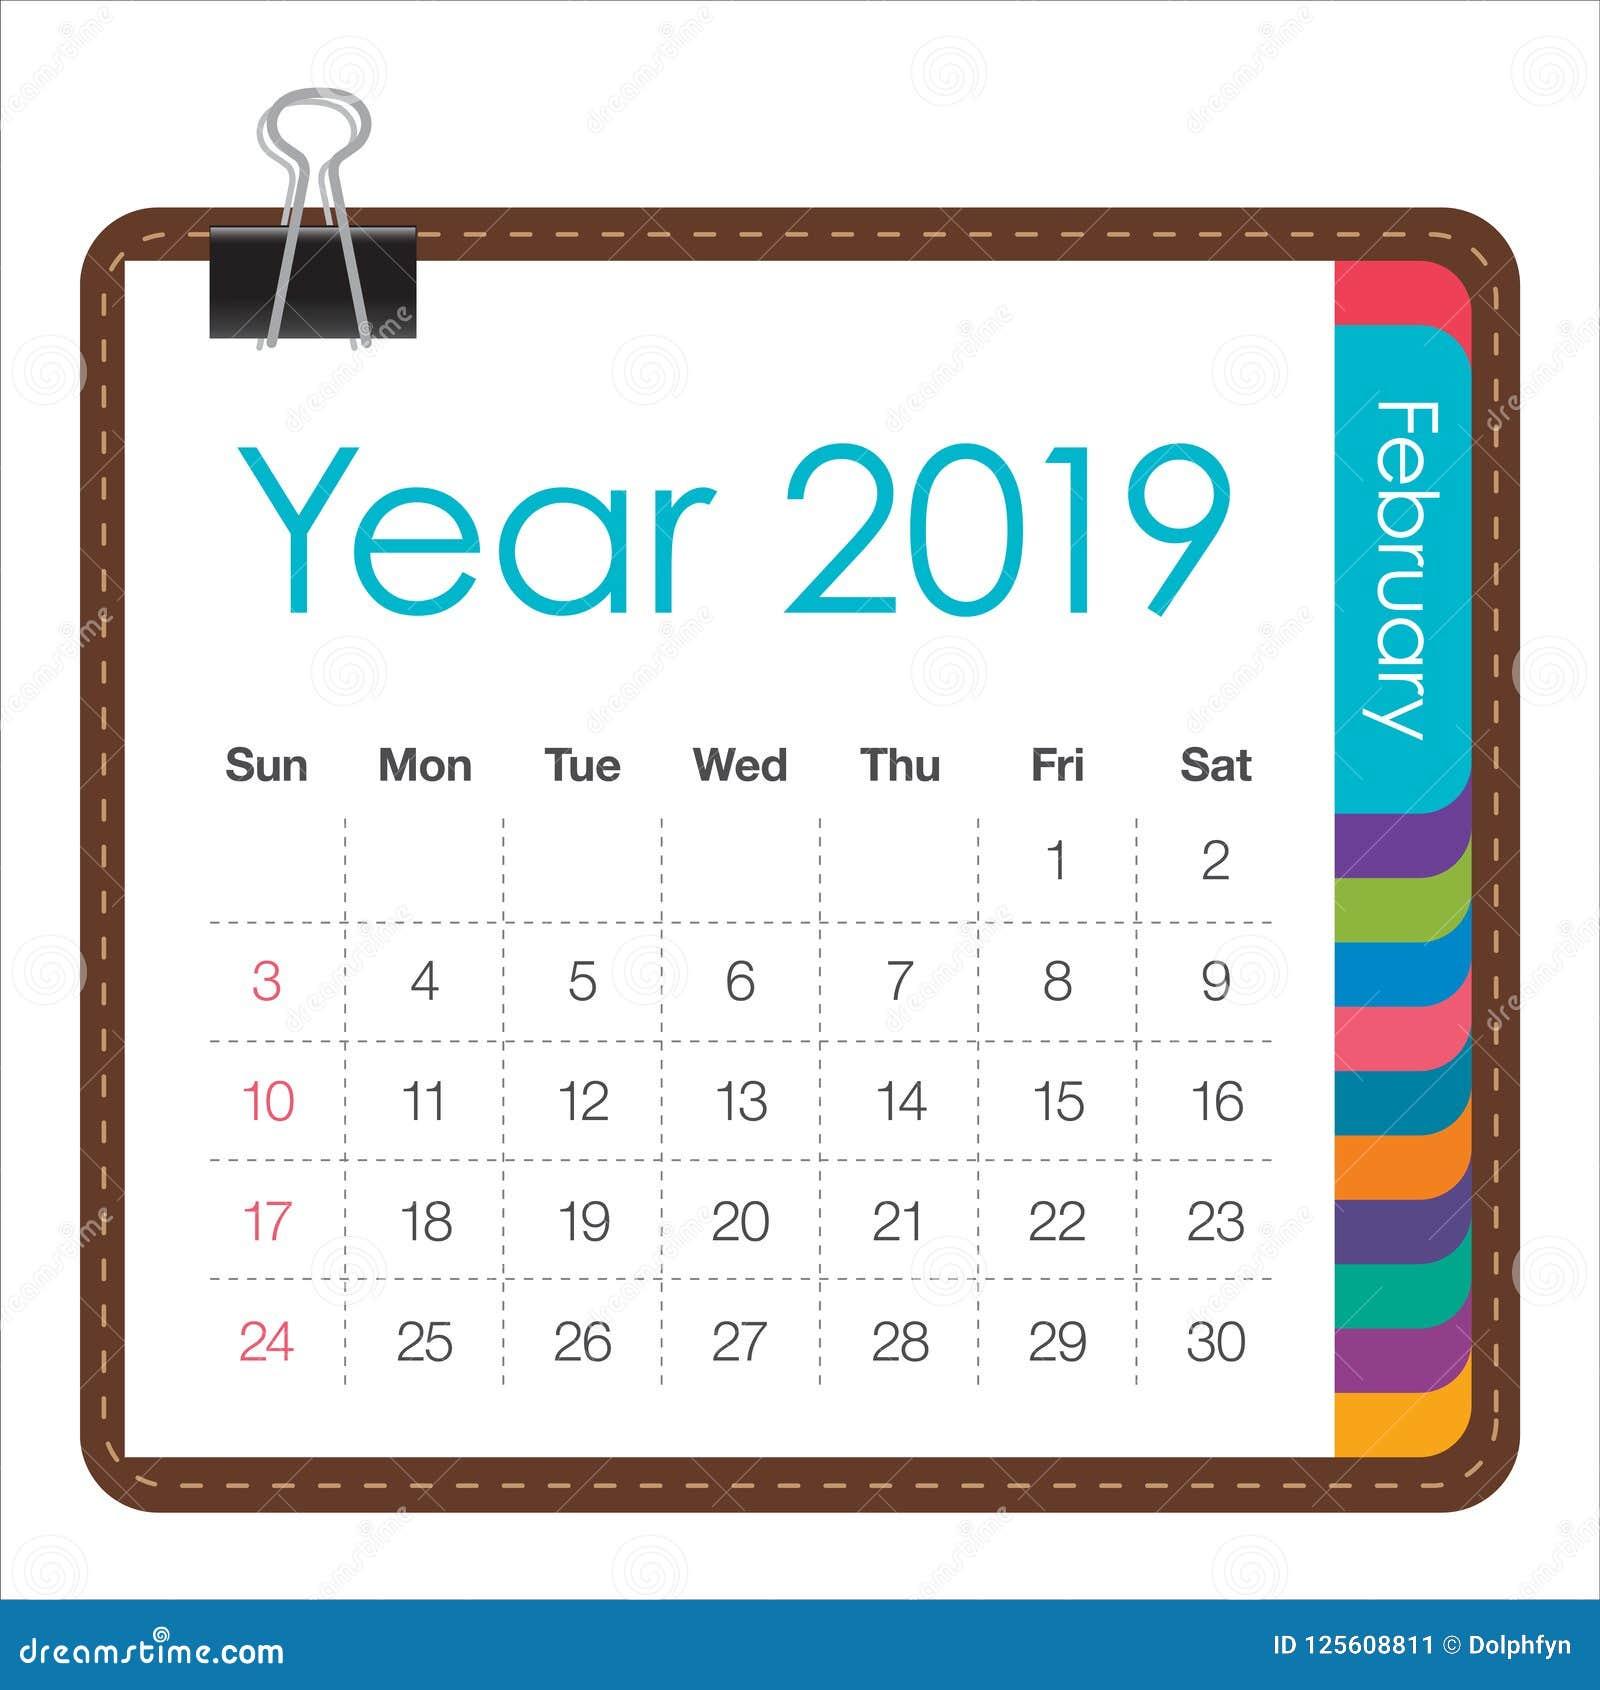 February 2019 Monthly Calendar Vector Illustration Stock